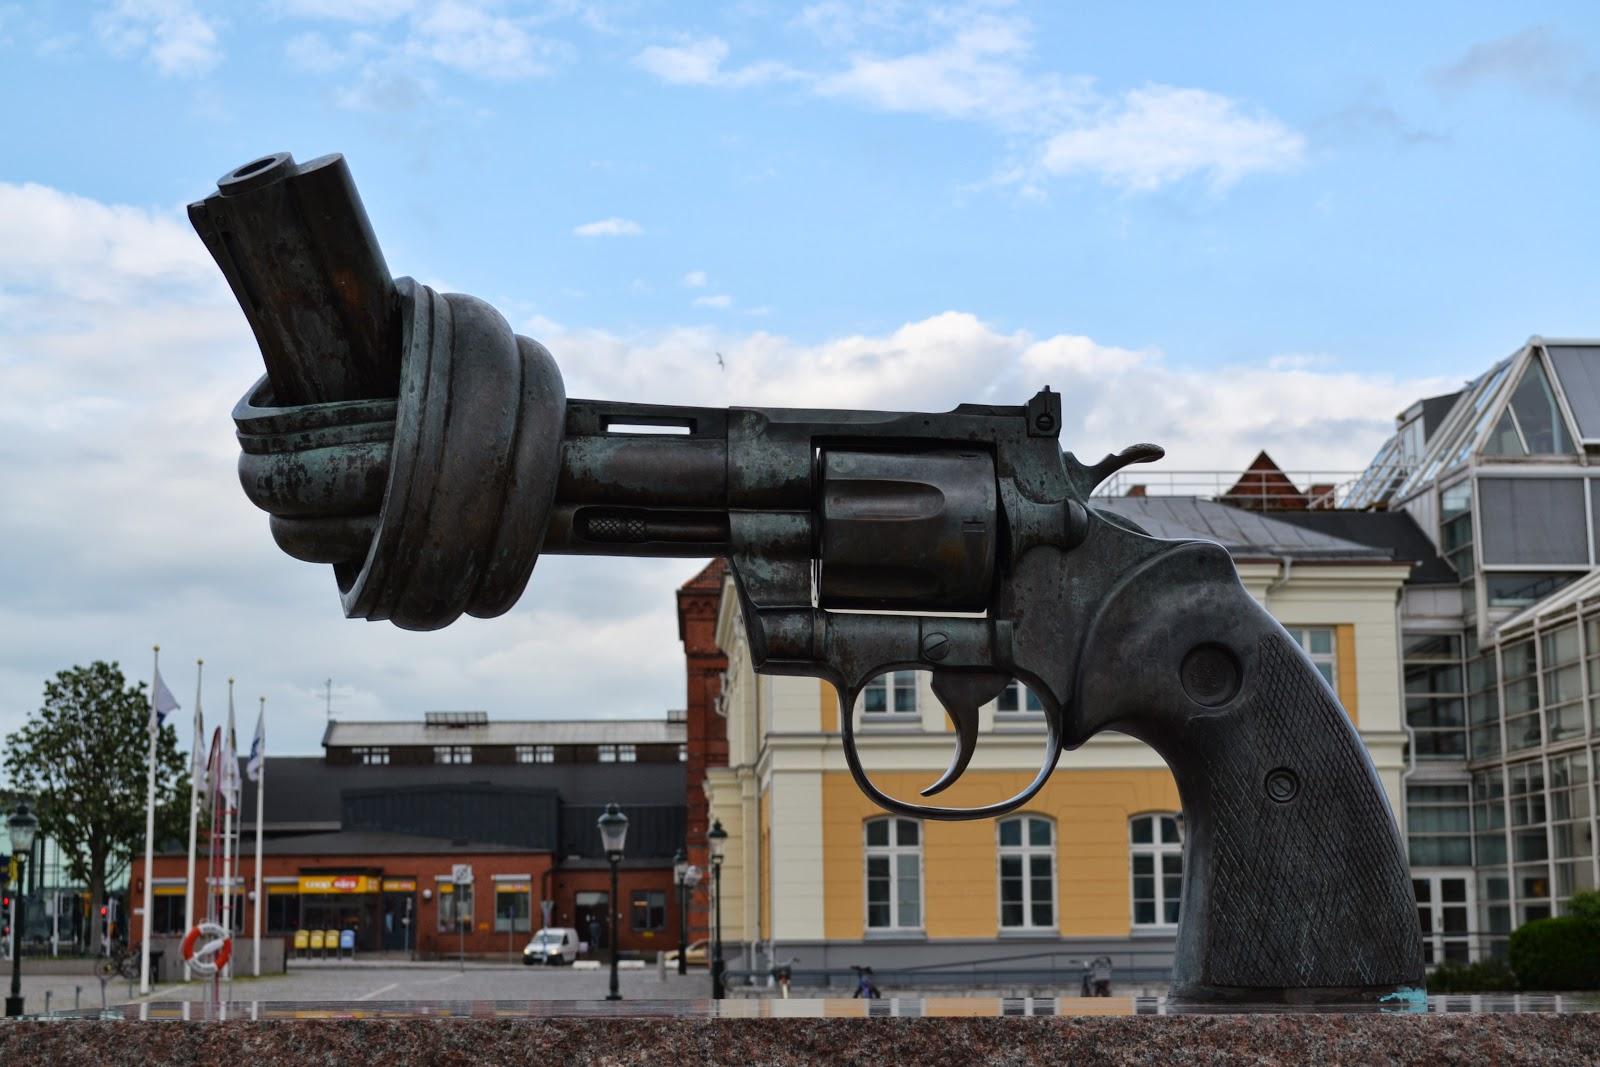 Non-Violence  bronze sculpture of Gun by Swedish artist Carl Fredrik Reuterswärd